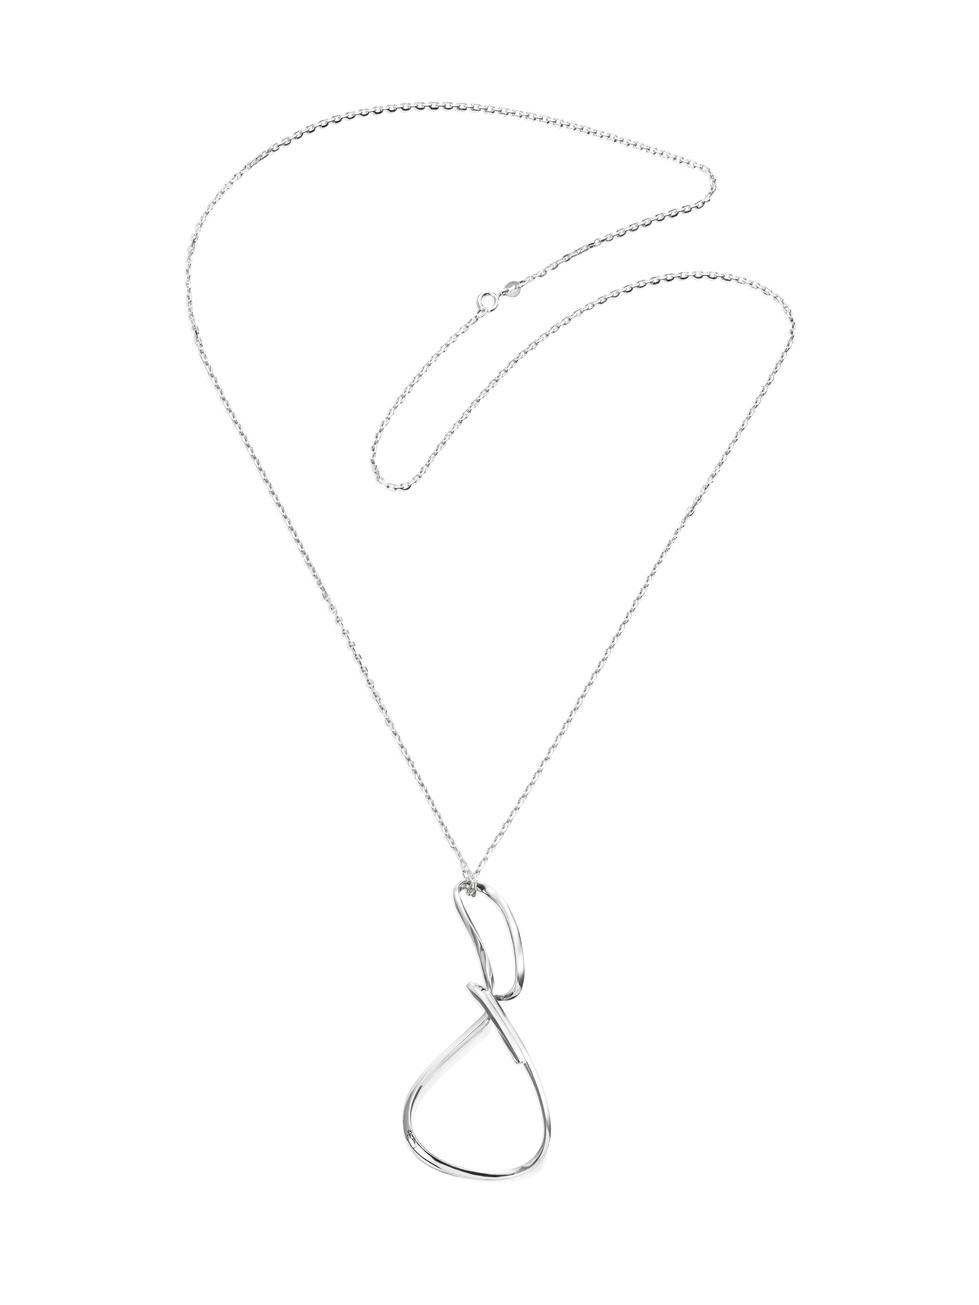 Twisting Pendant 11-100-01294(1)